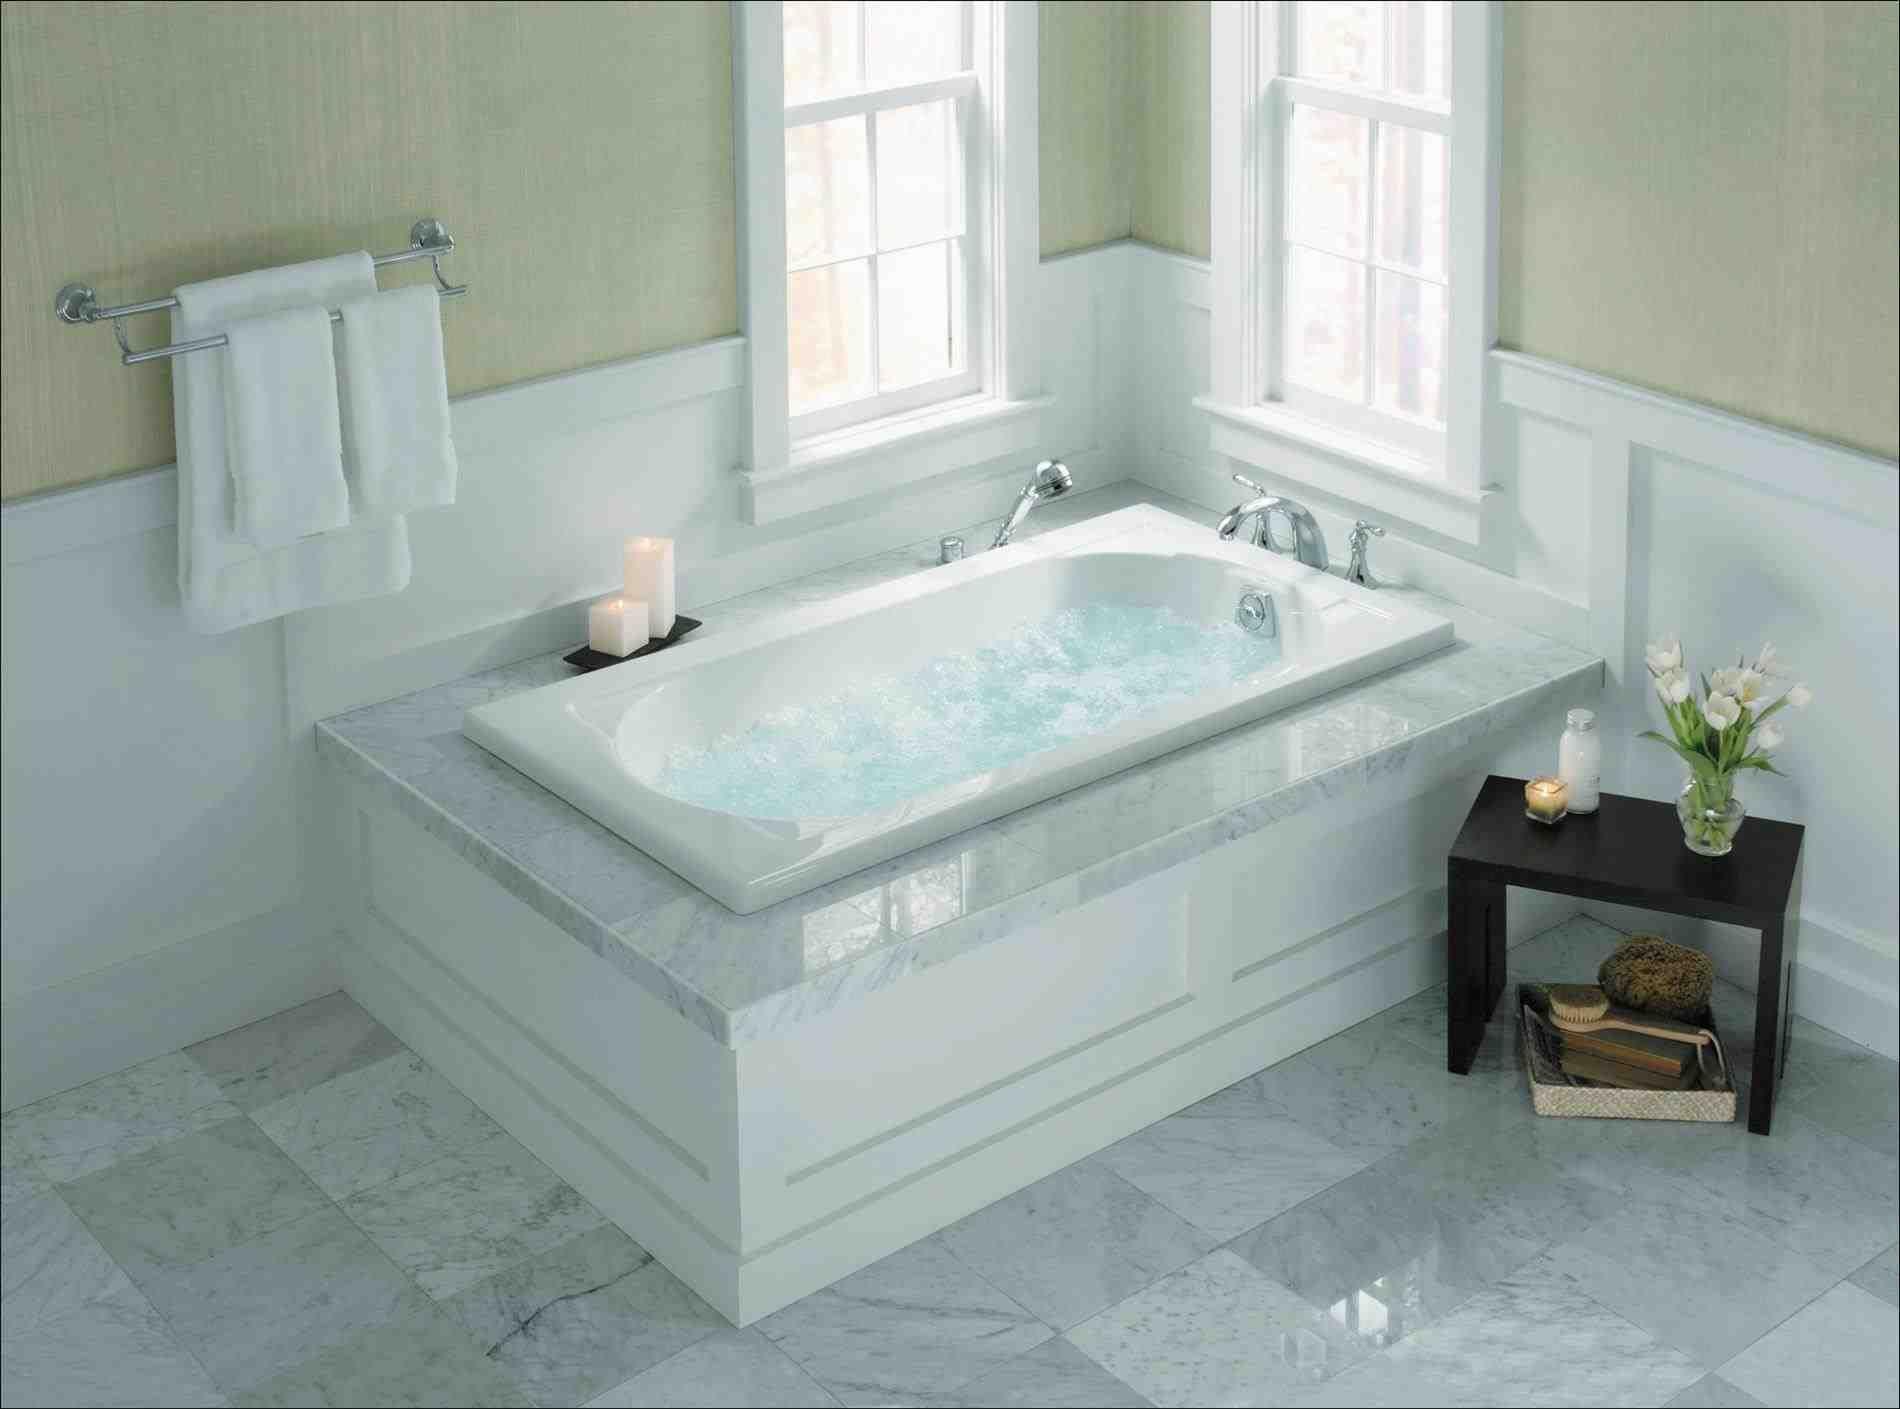 This garden tub with jets - stunning garden tub decorating ideas ...